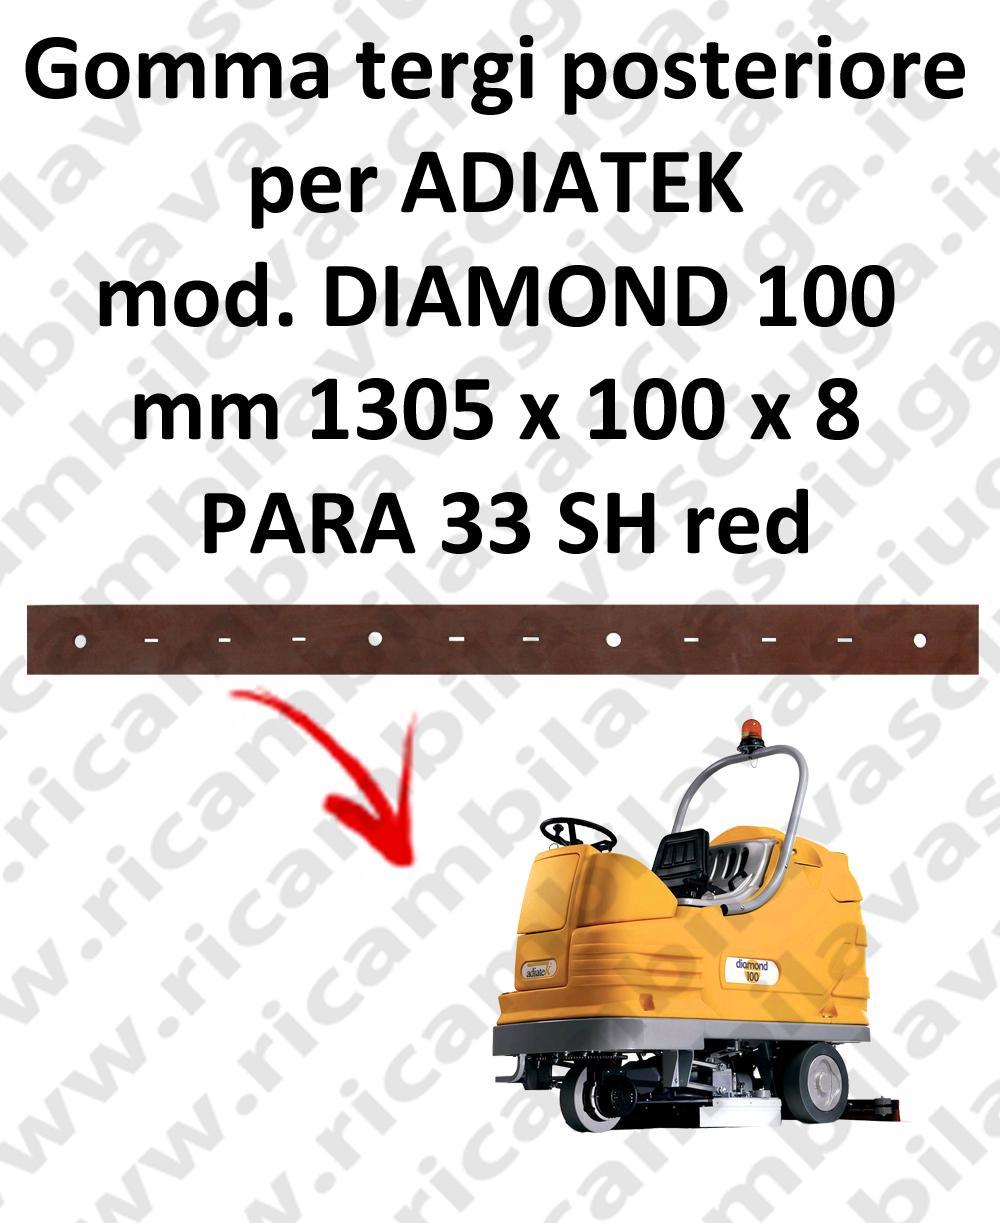 DIAMOND 100 GOMMA TERGI posteriore per lavapavimenti ADIATEK